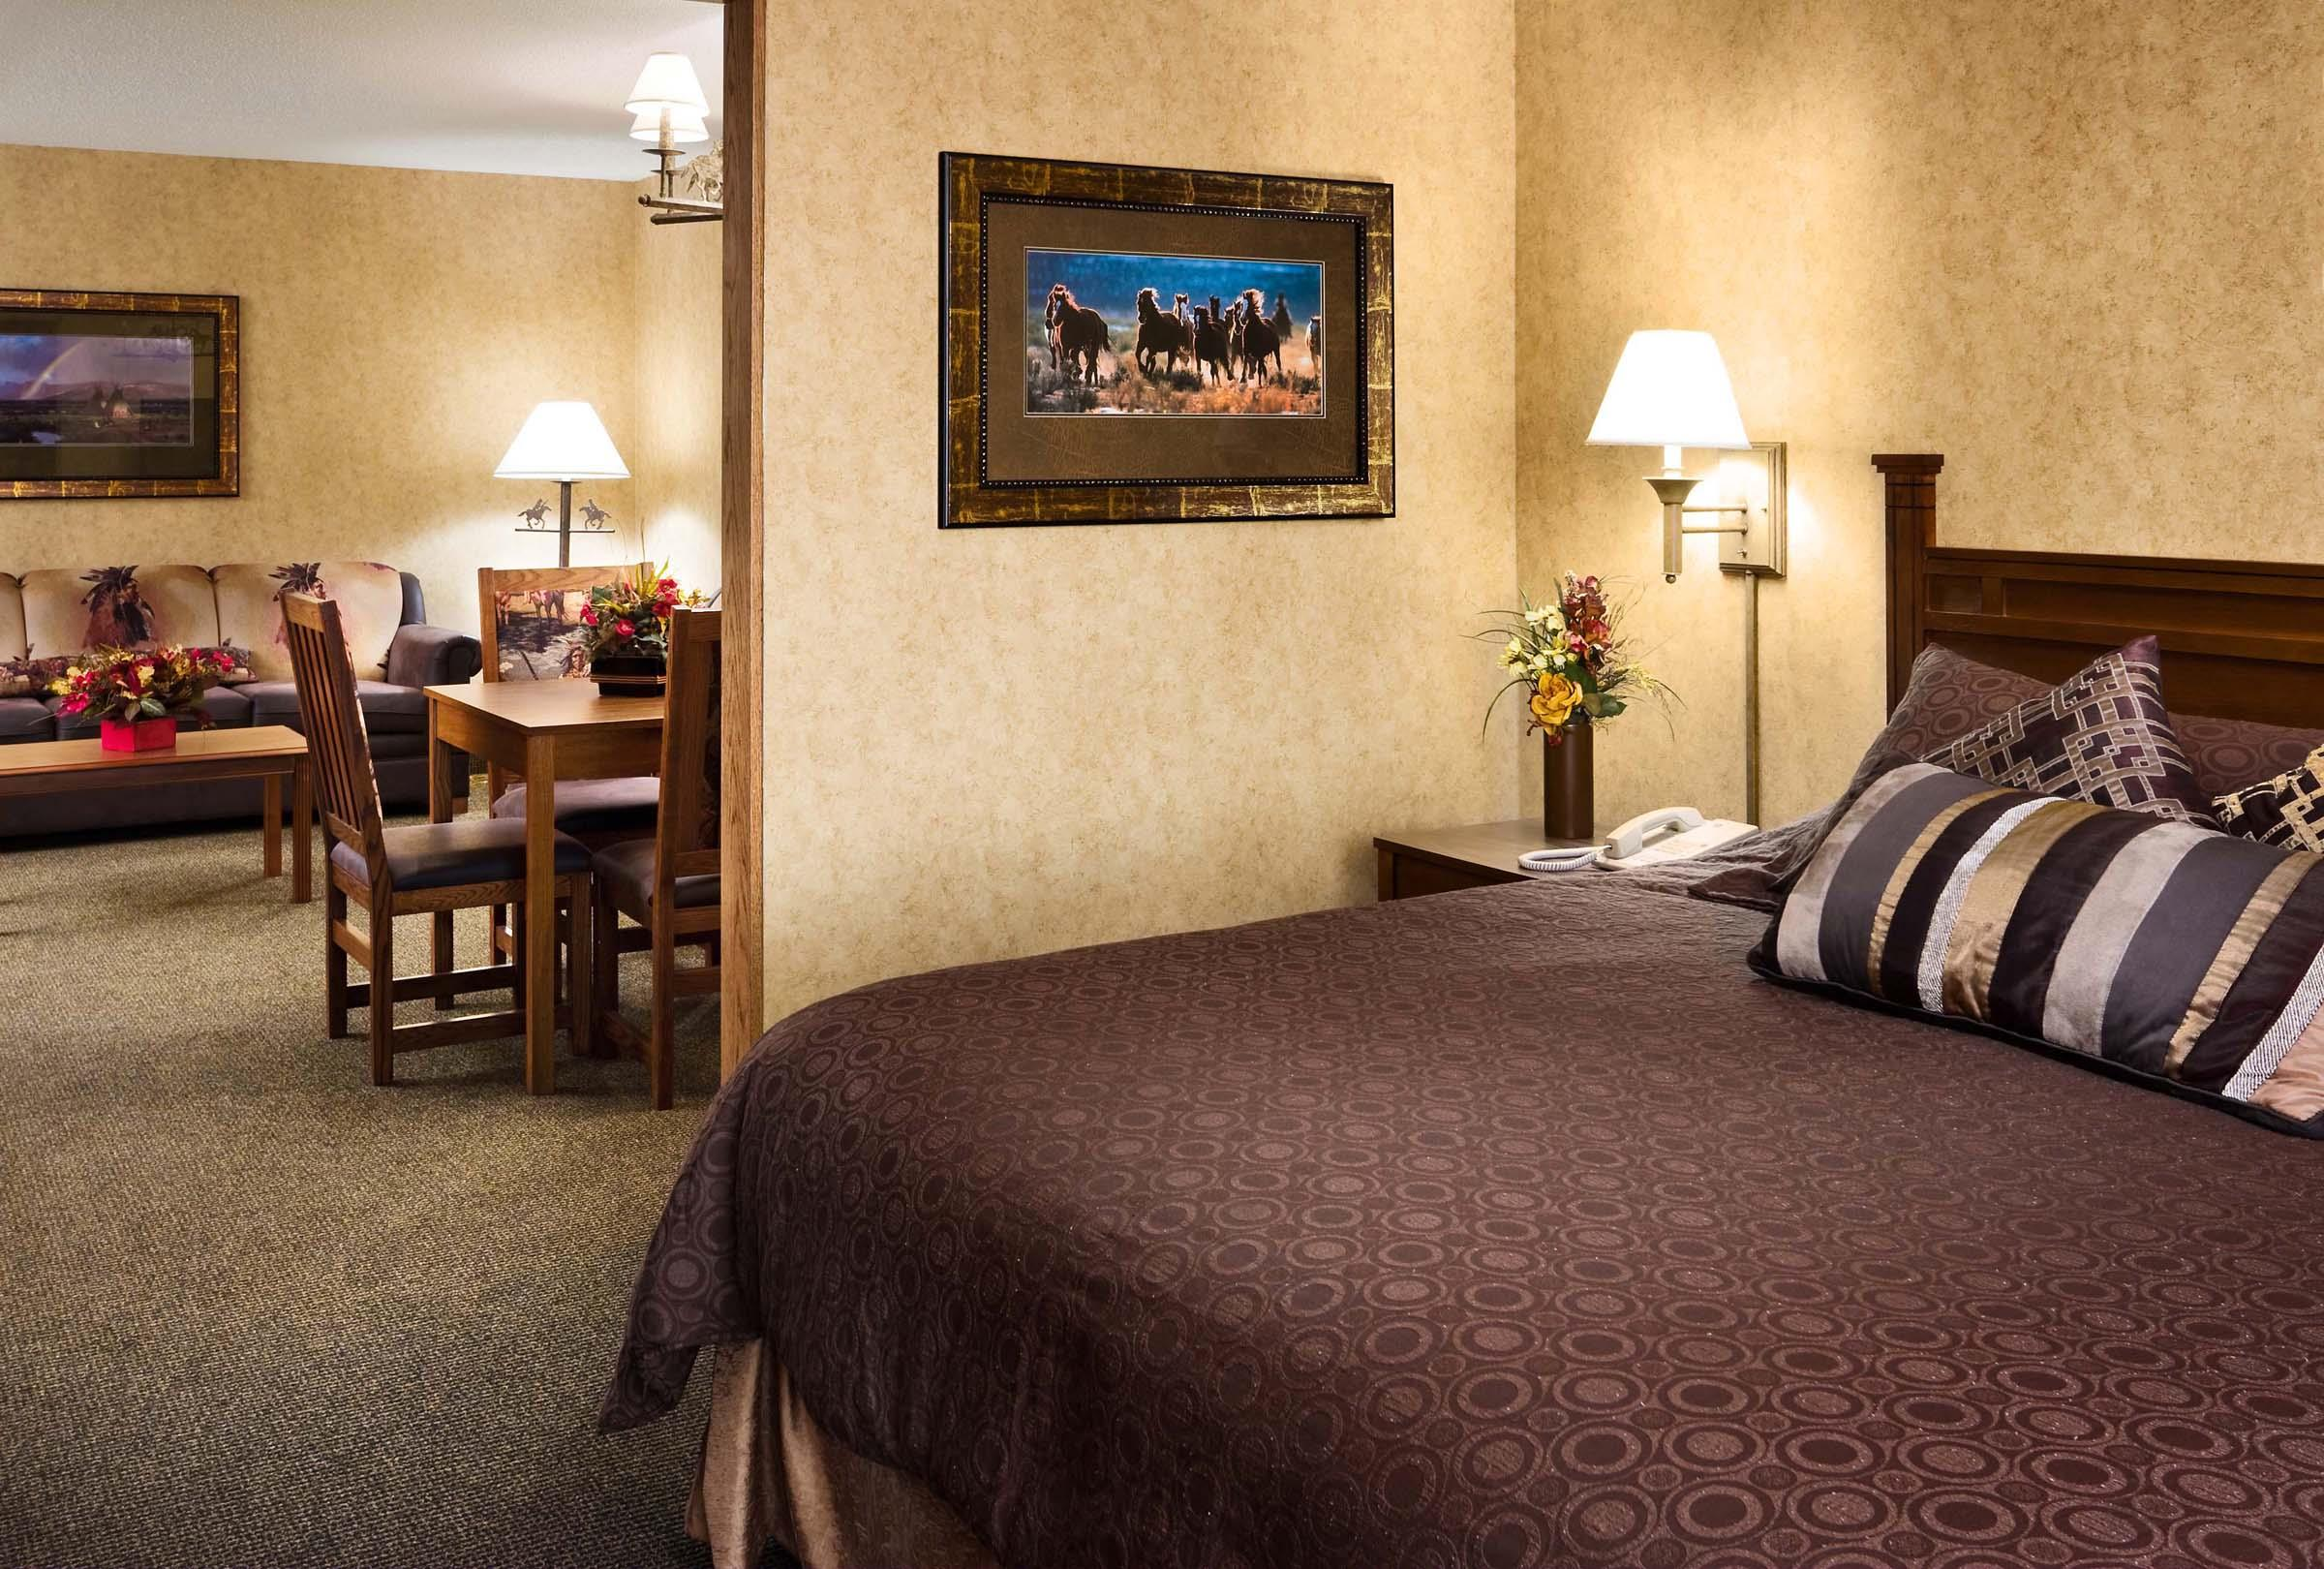 Best Western Ramkota Hotel image 15